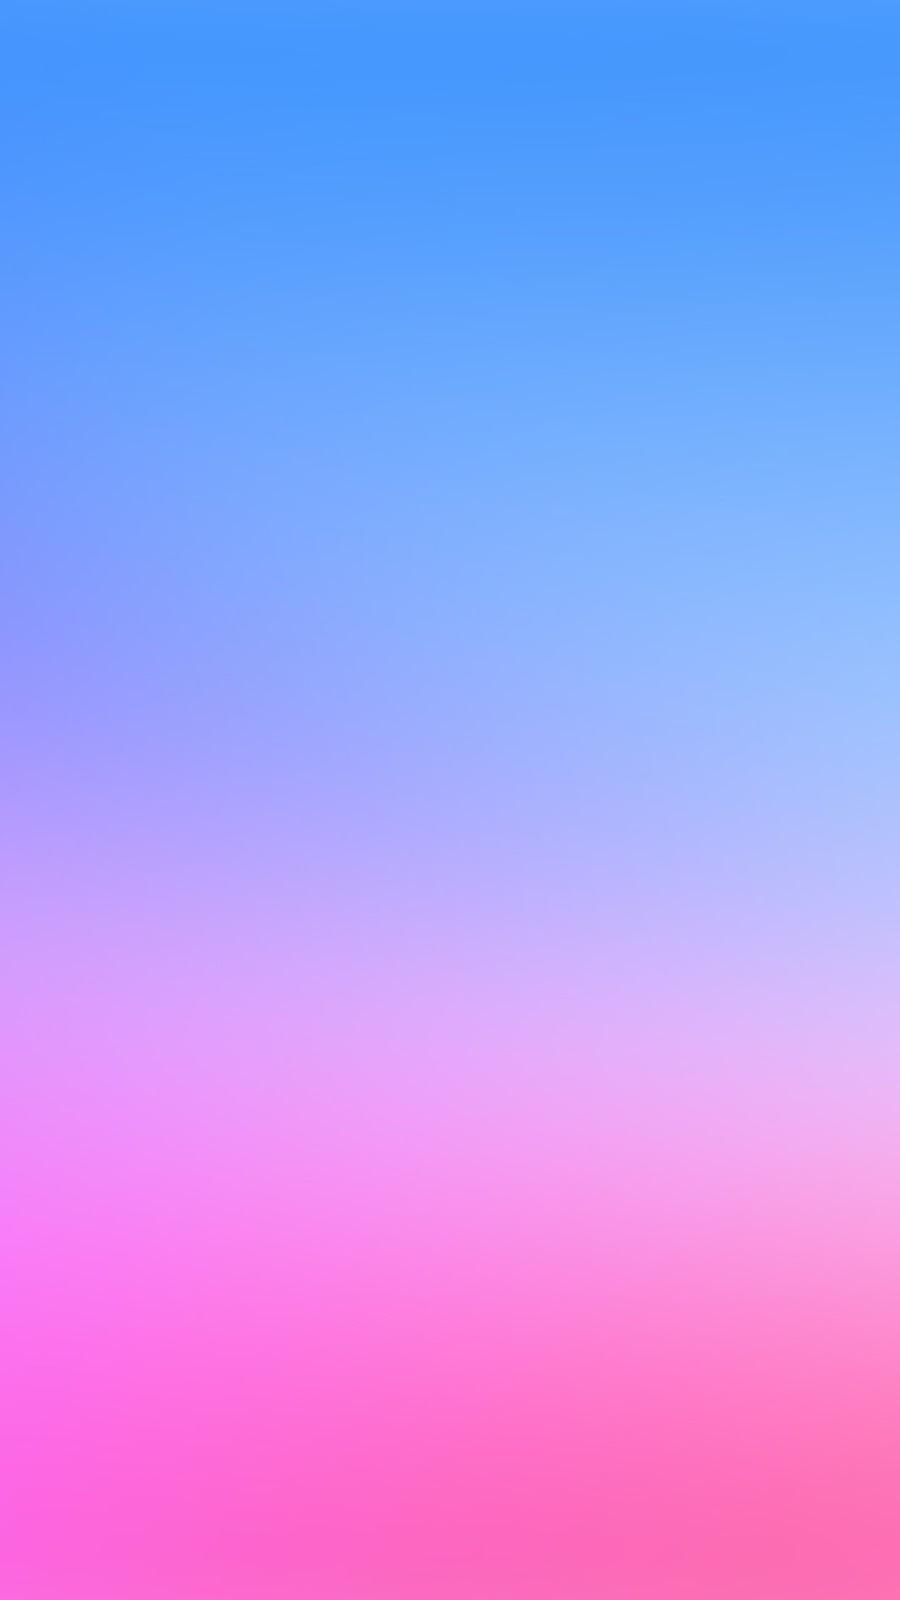 Retina iPhone 7 Plus 4k HD Wallpapers